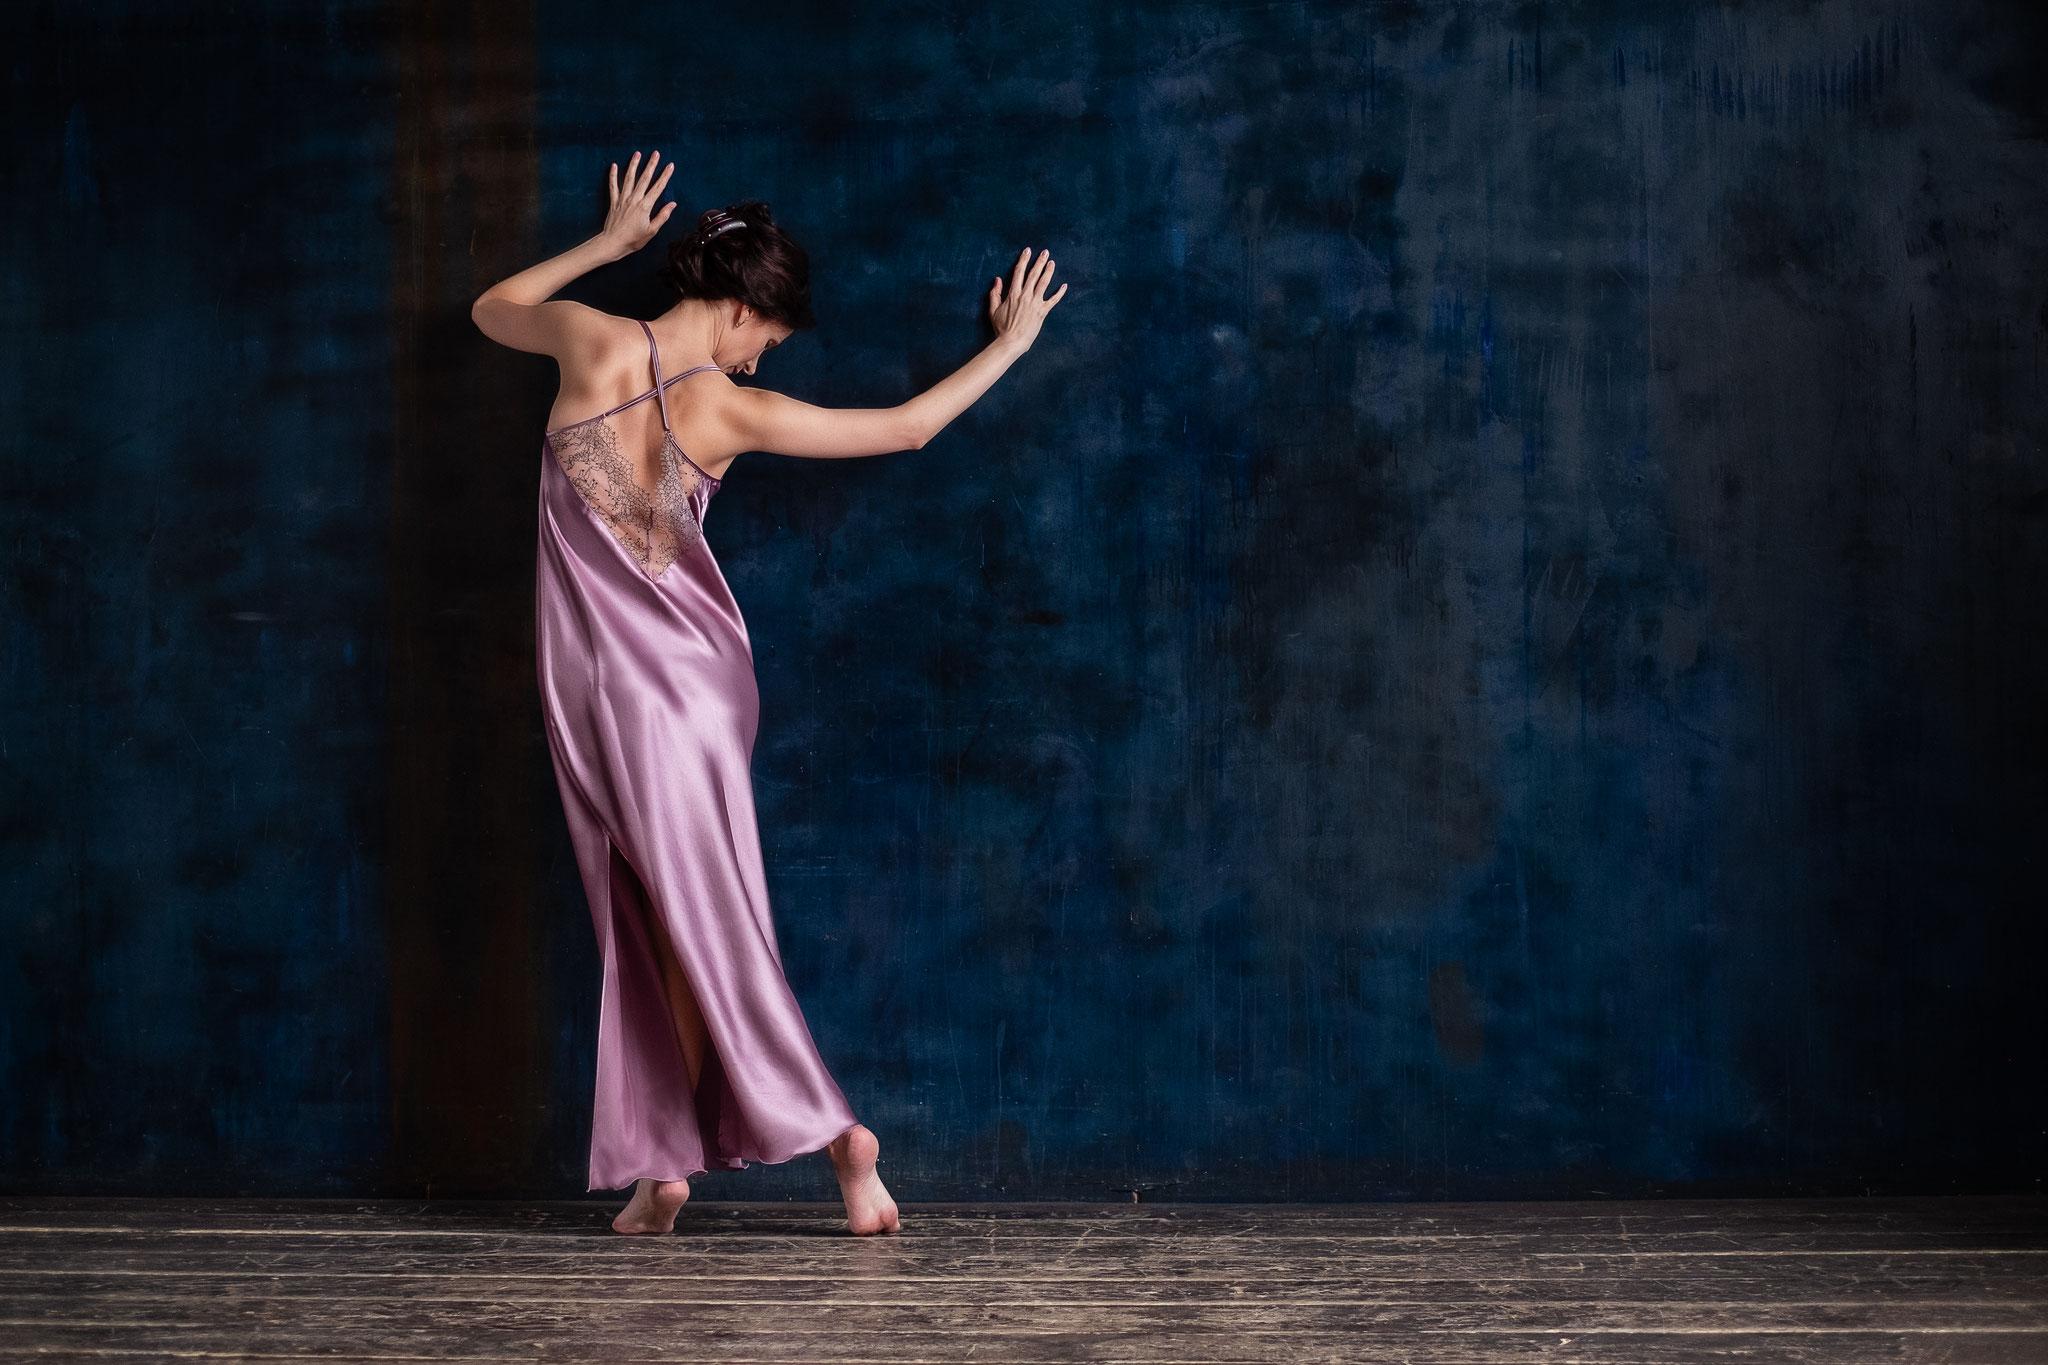 Ekaterina Shuvalova (Russia) - Women' strength